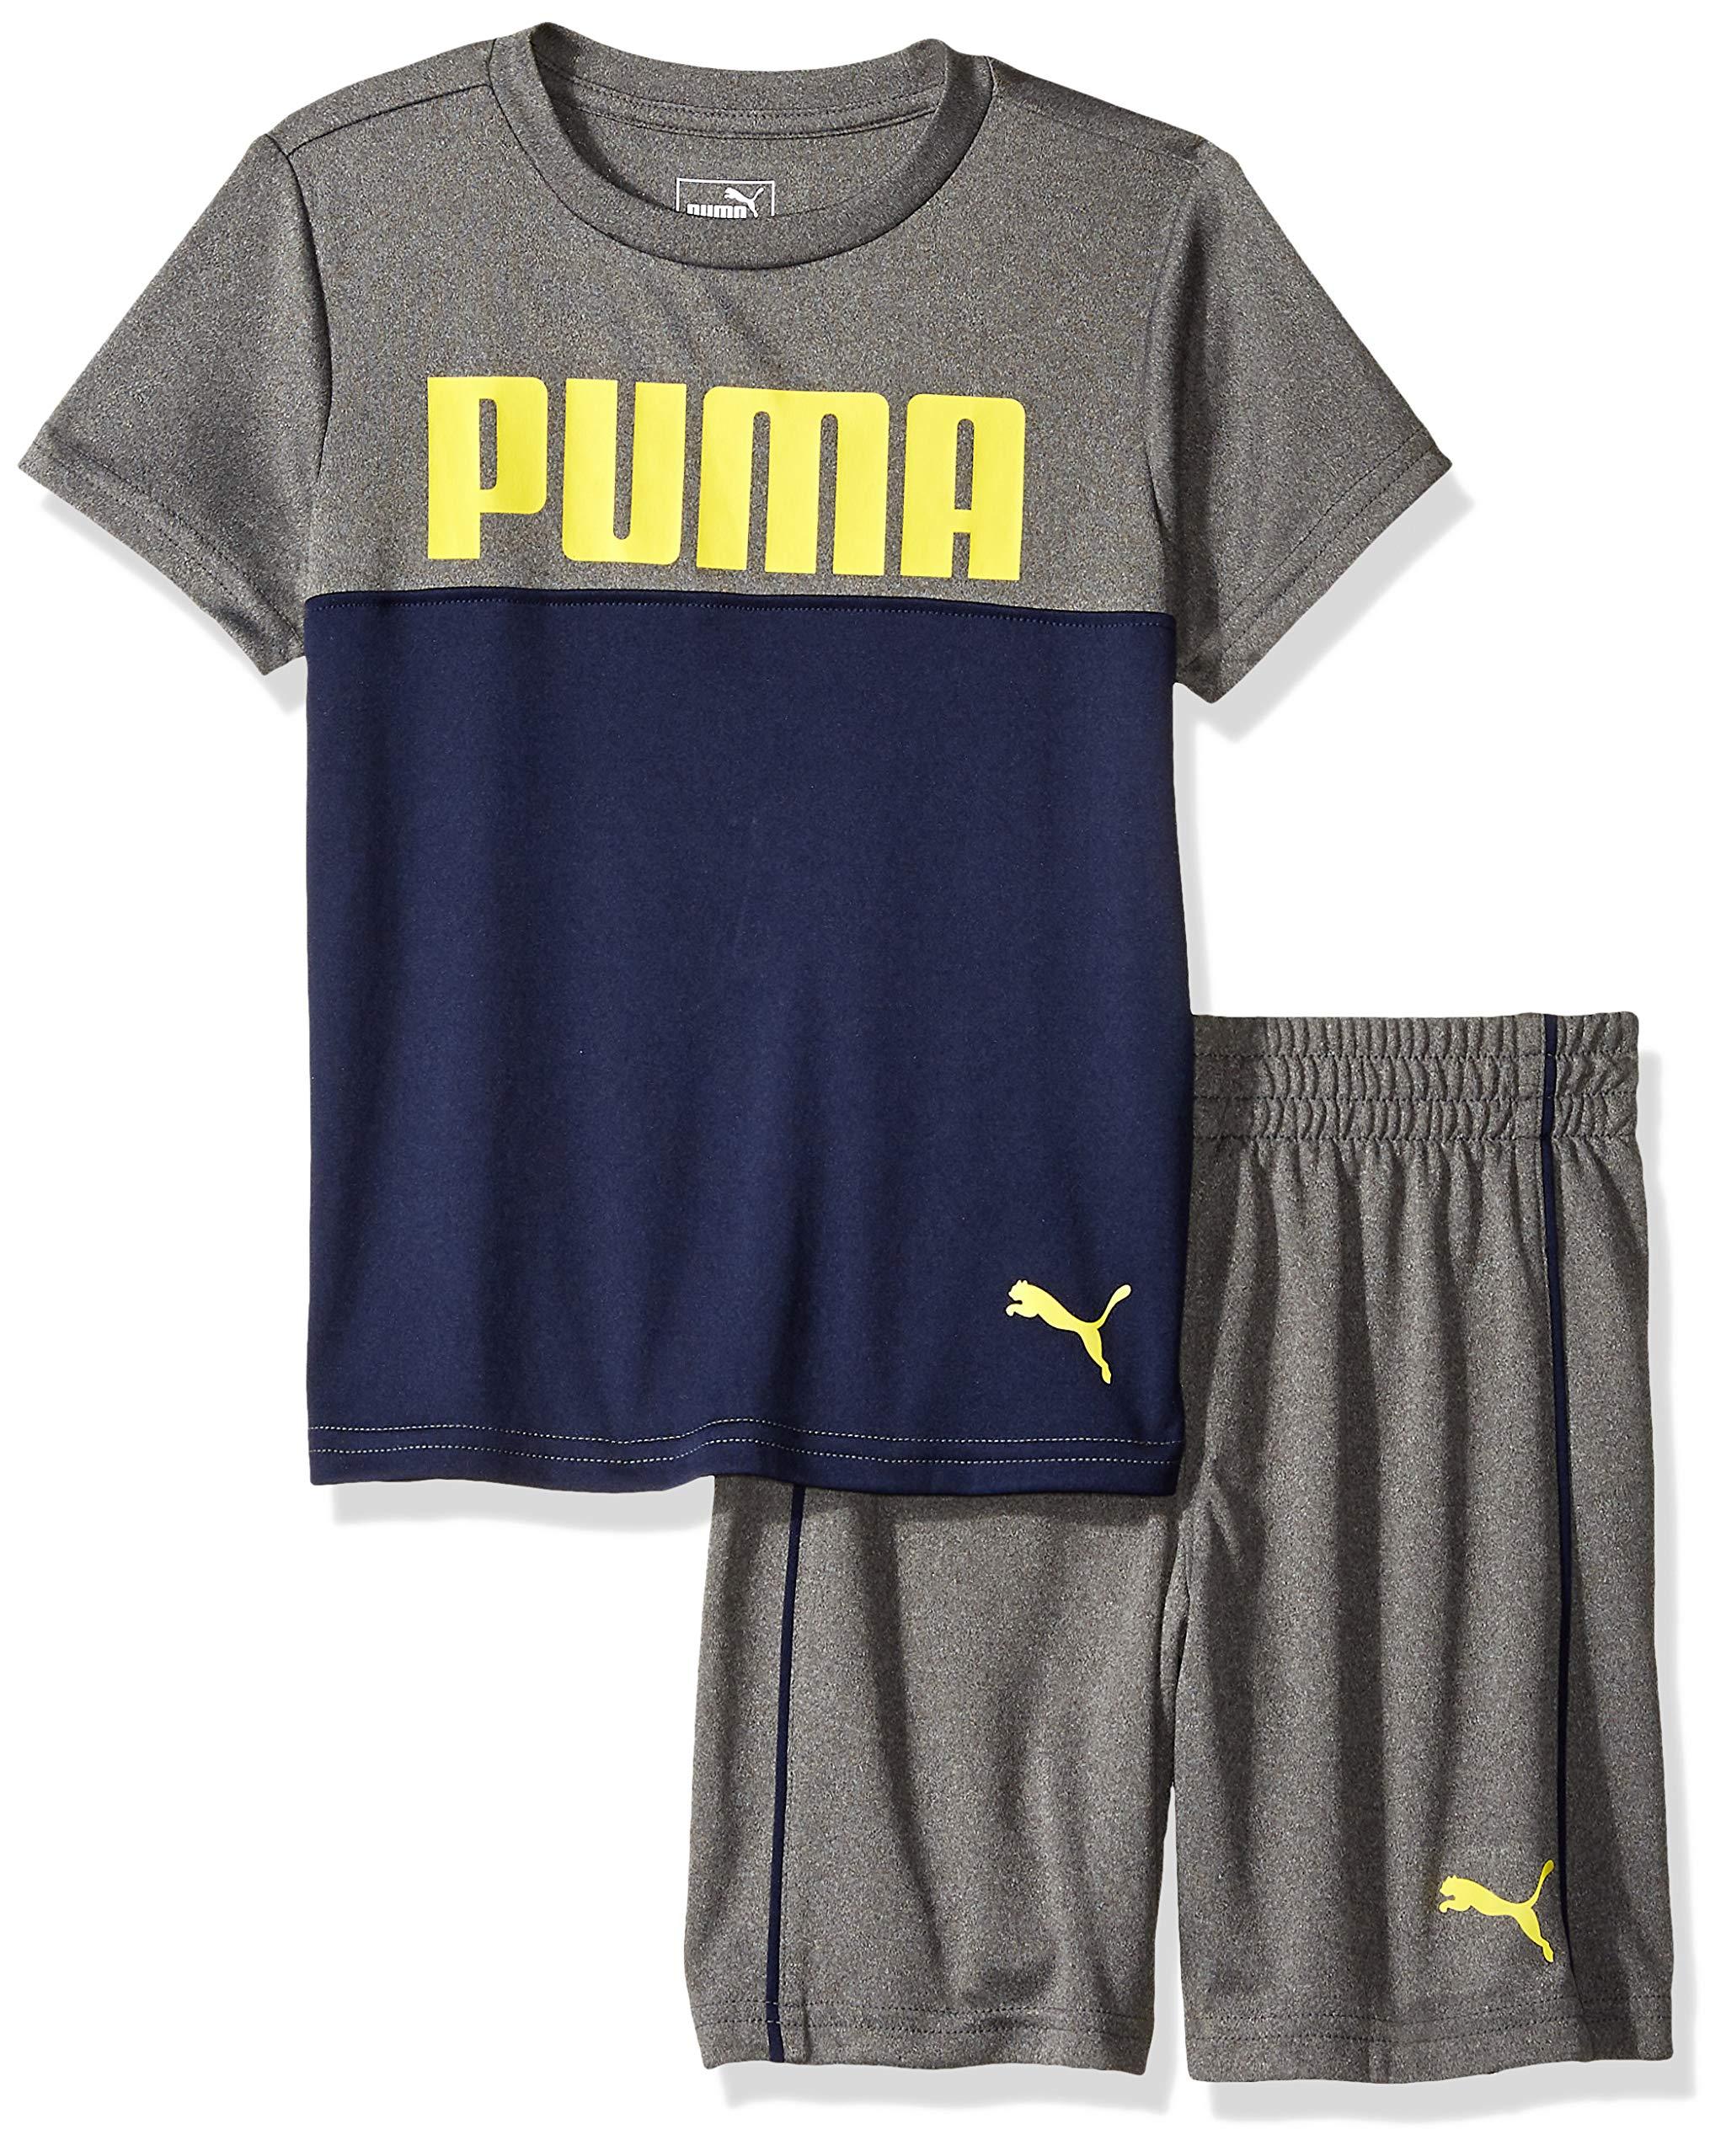 PUMA Little Boys' T-Shirt & Short Set, Coal Heather Grey 4